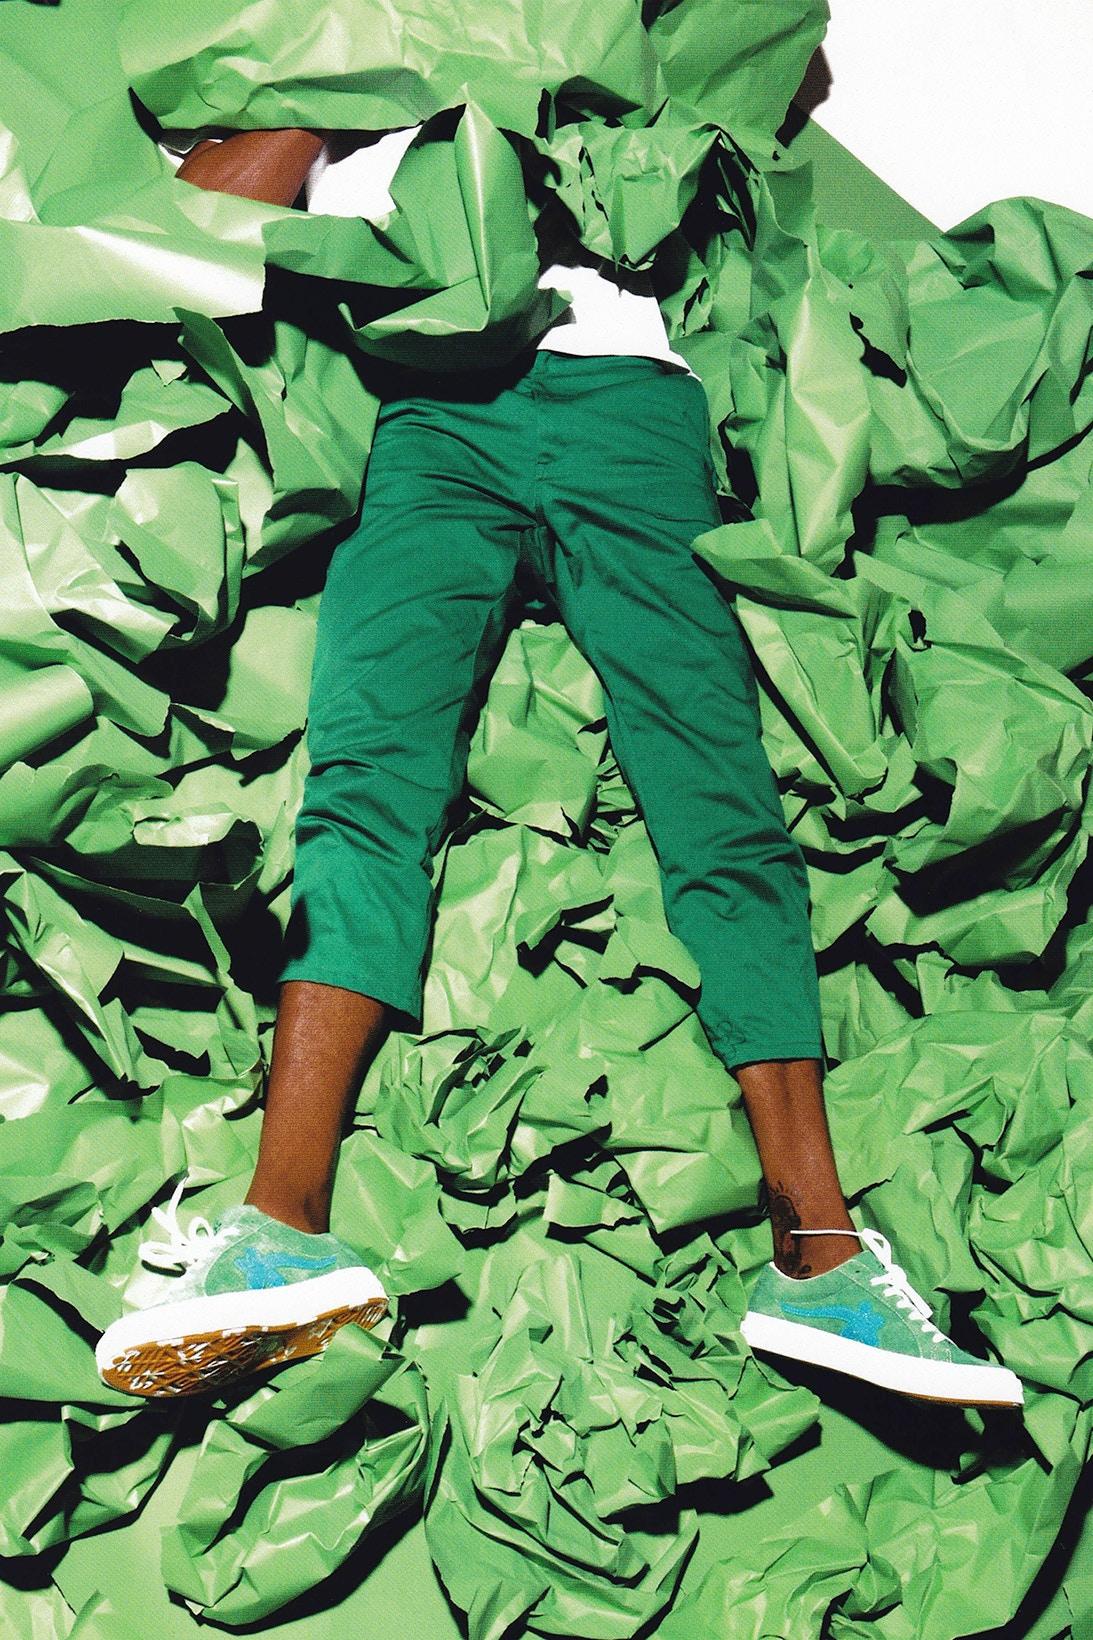 Converse One Star Ox Tyler the Creator Golf Le Fleur Jolly Green